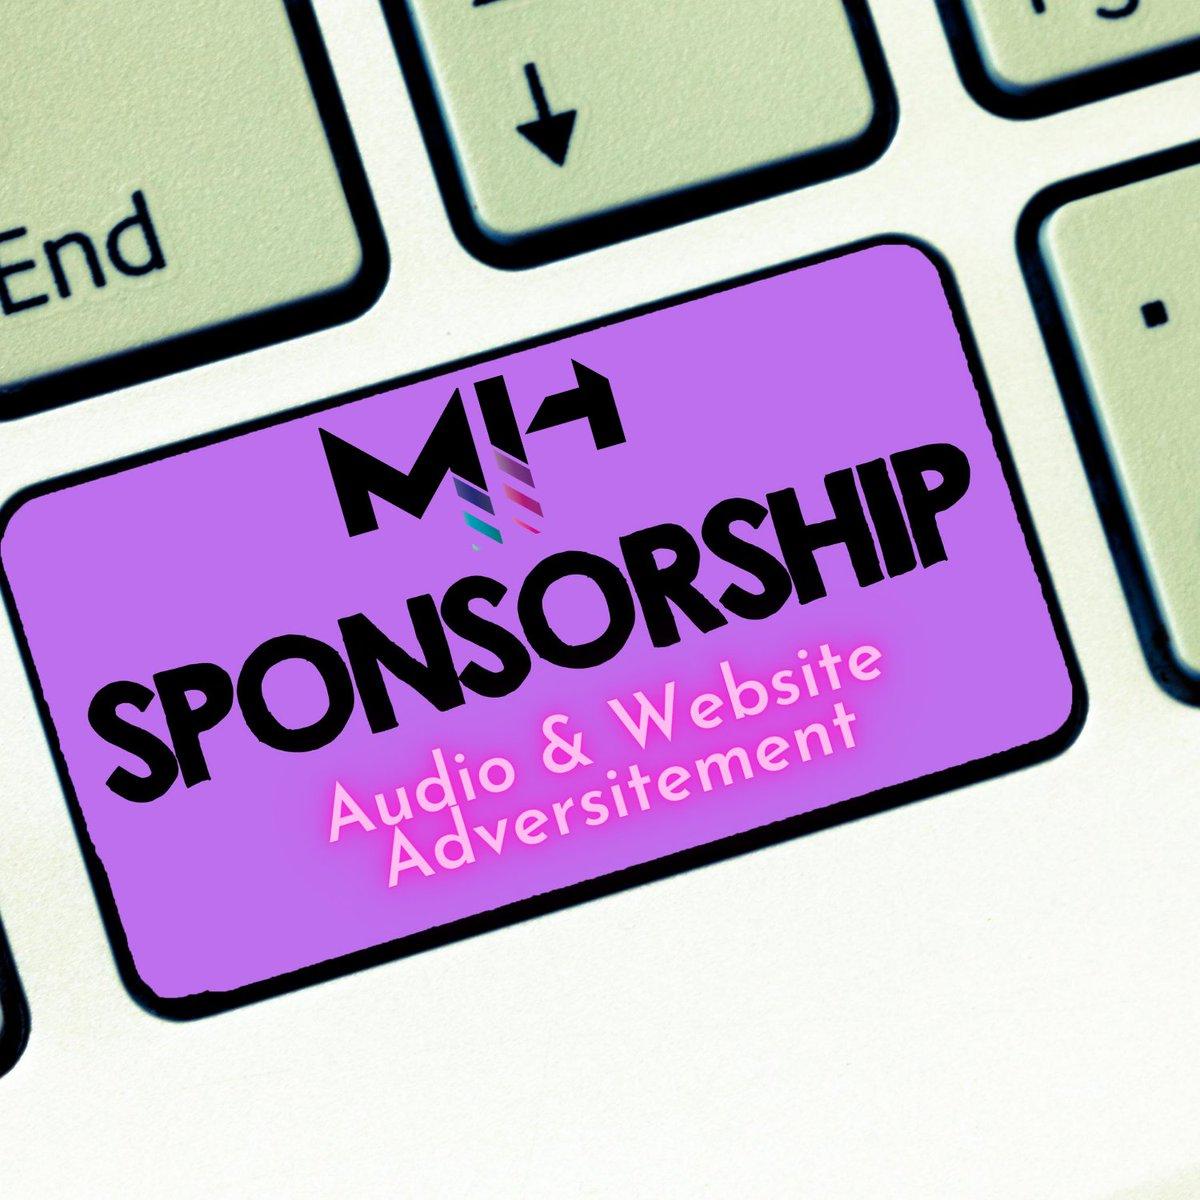 #ADVERTISING, #SPONSORSHIP & #AIRPLAY INQUIRIES: https://t.co/bHd0sgqFhX 💜 #RNB #RNBMusic #SoulMusic #Urban #Trap #Chill #Vibes #Mood #Jazz #Downtempo #DNB #LoFi #internetradio  #musicstartup #musicbusiness https://t.co/GDr6hGYzDl